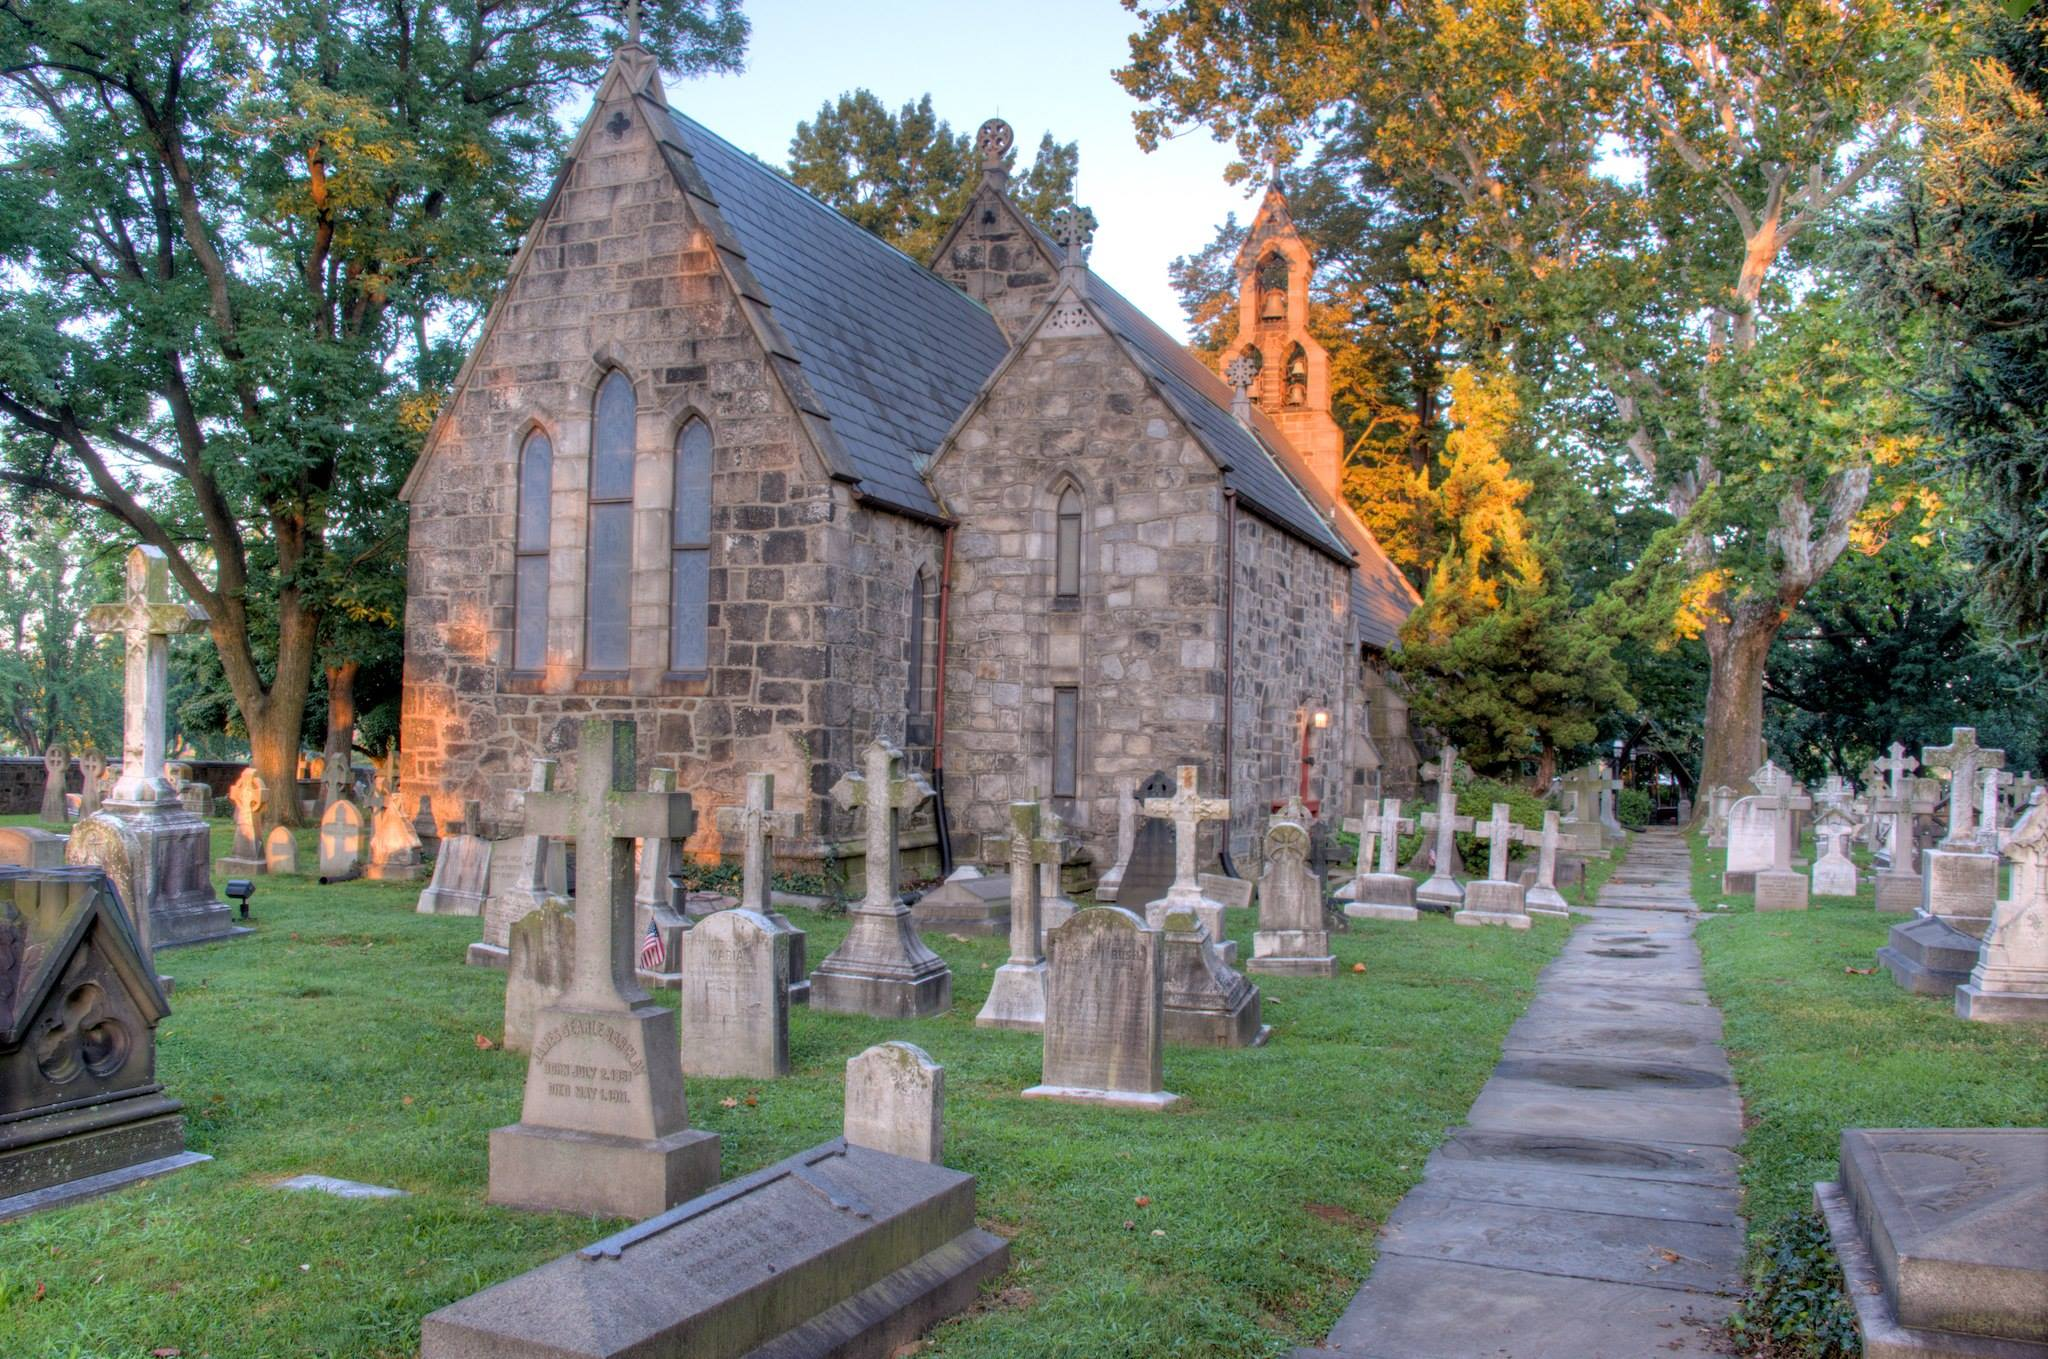 File:St. James the Less Cemetery.jpg